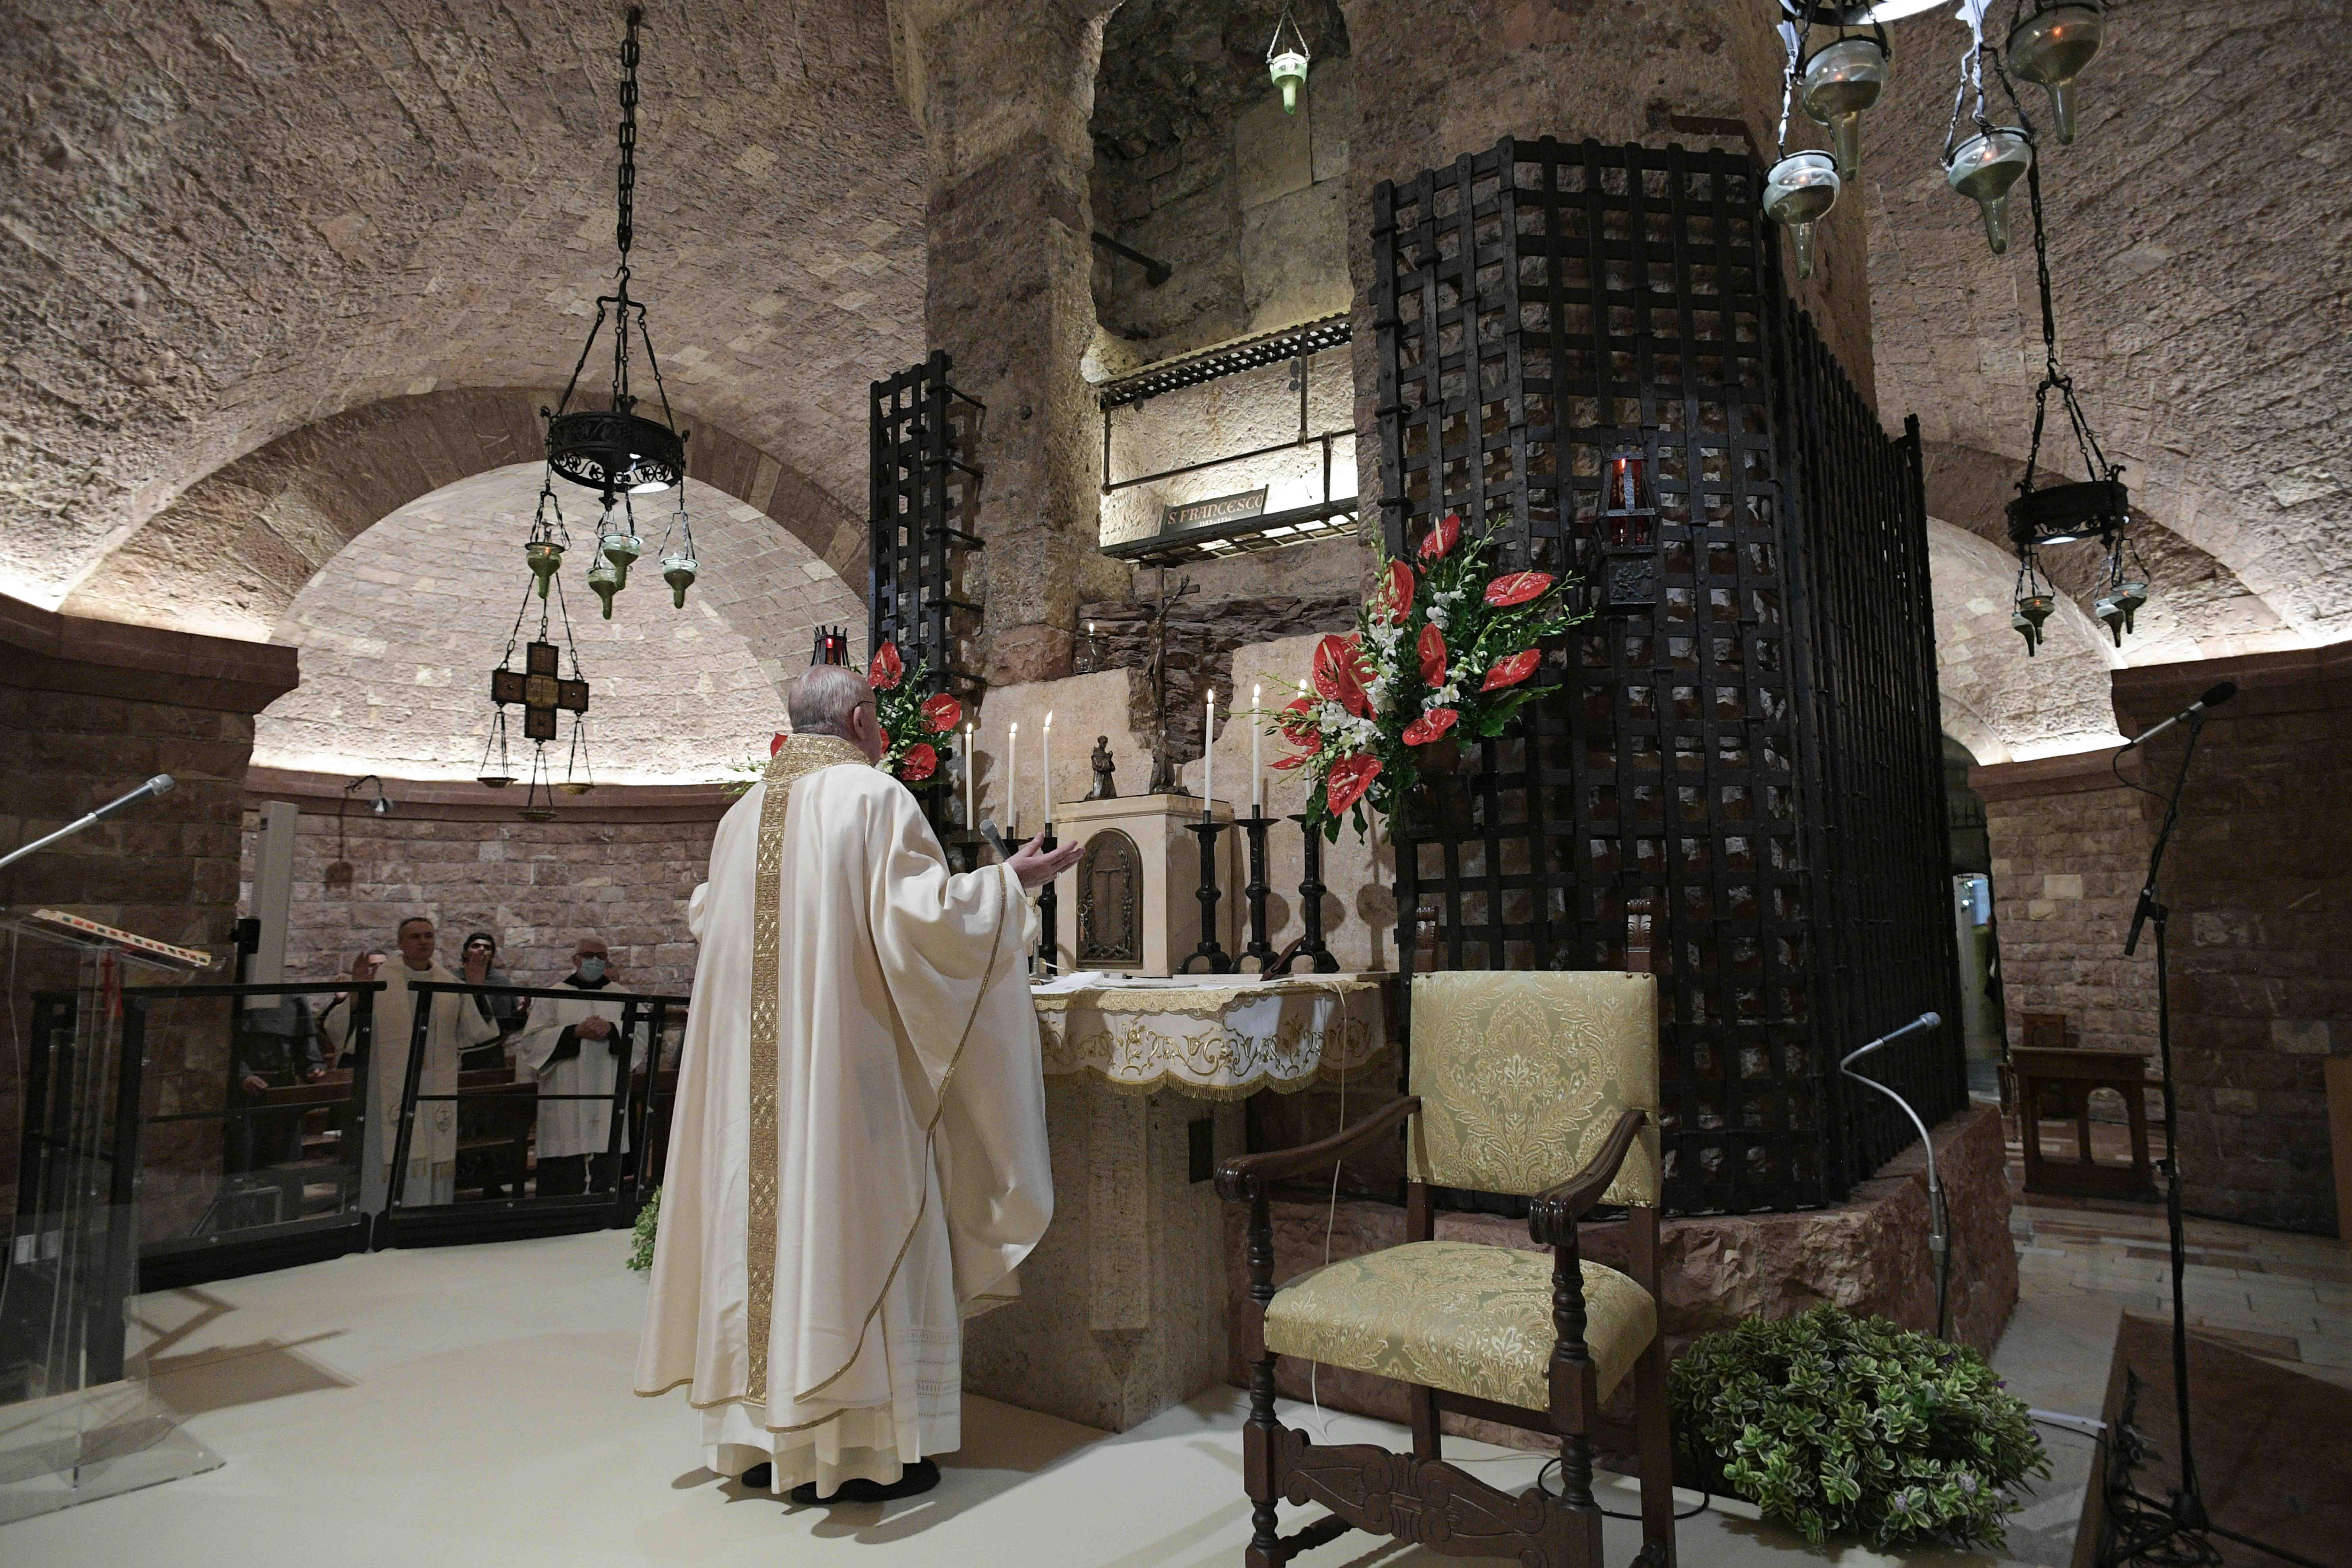 Visite à Assise, signature de Fratelli tutti, 3 octobre 2020 © Vatican Media